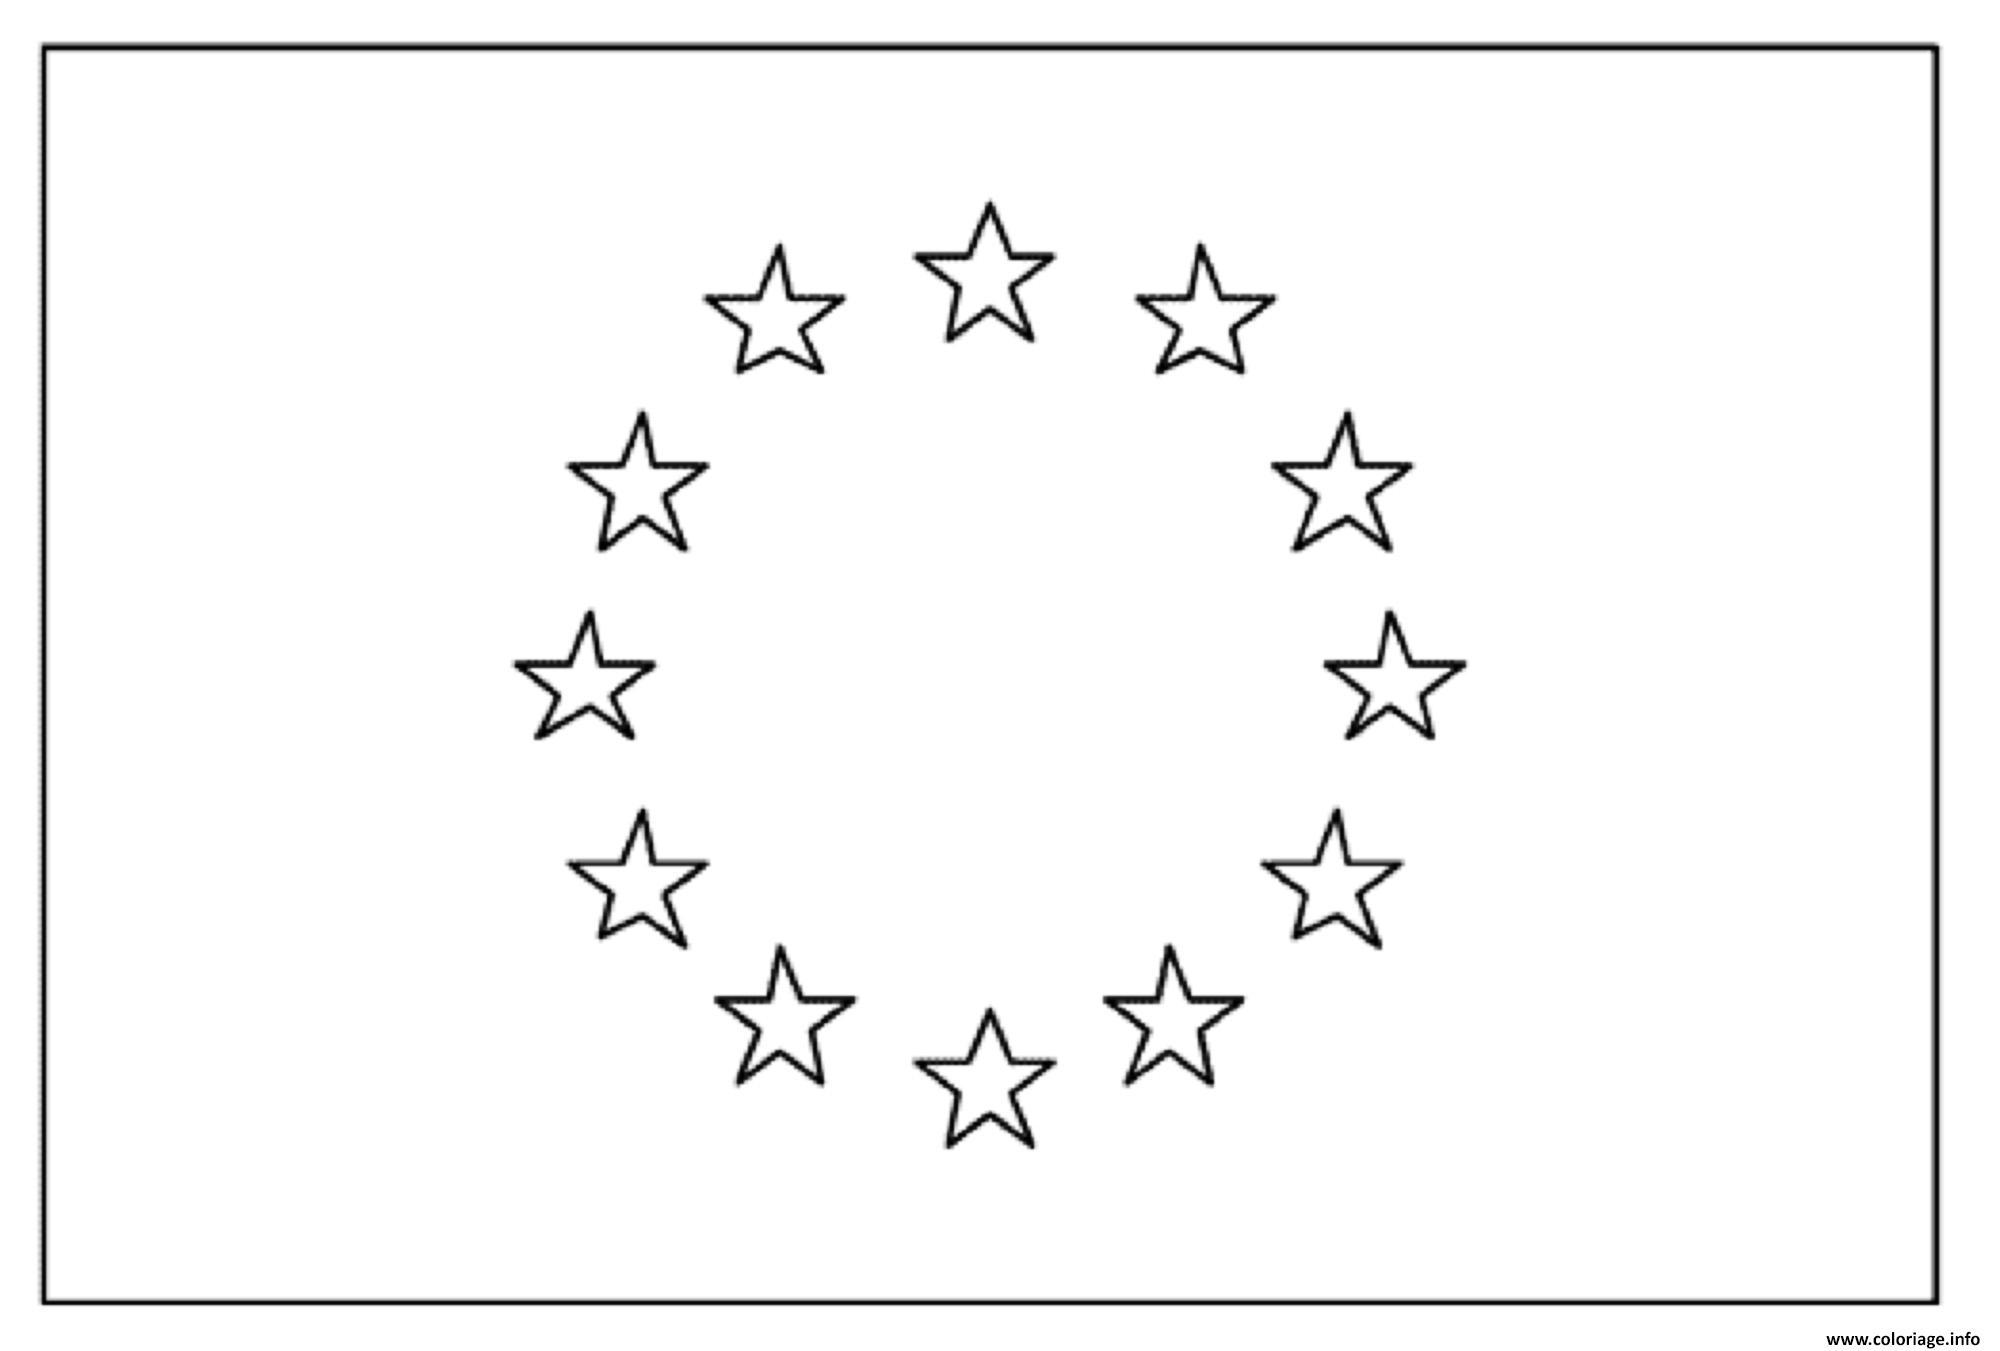 Dessin drapeau europe union europeenne Coloriage Gratuit à Imprimer